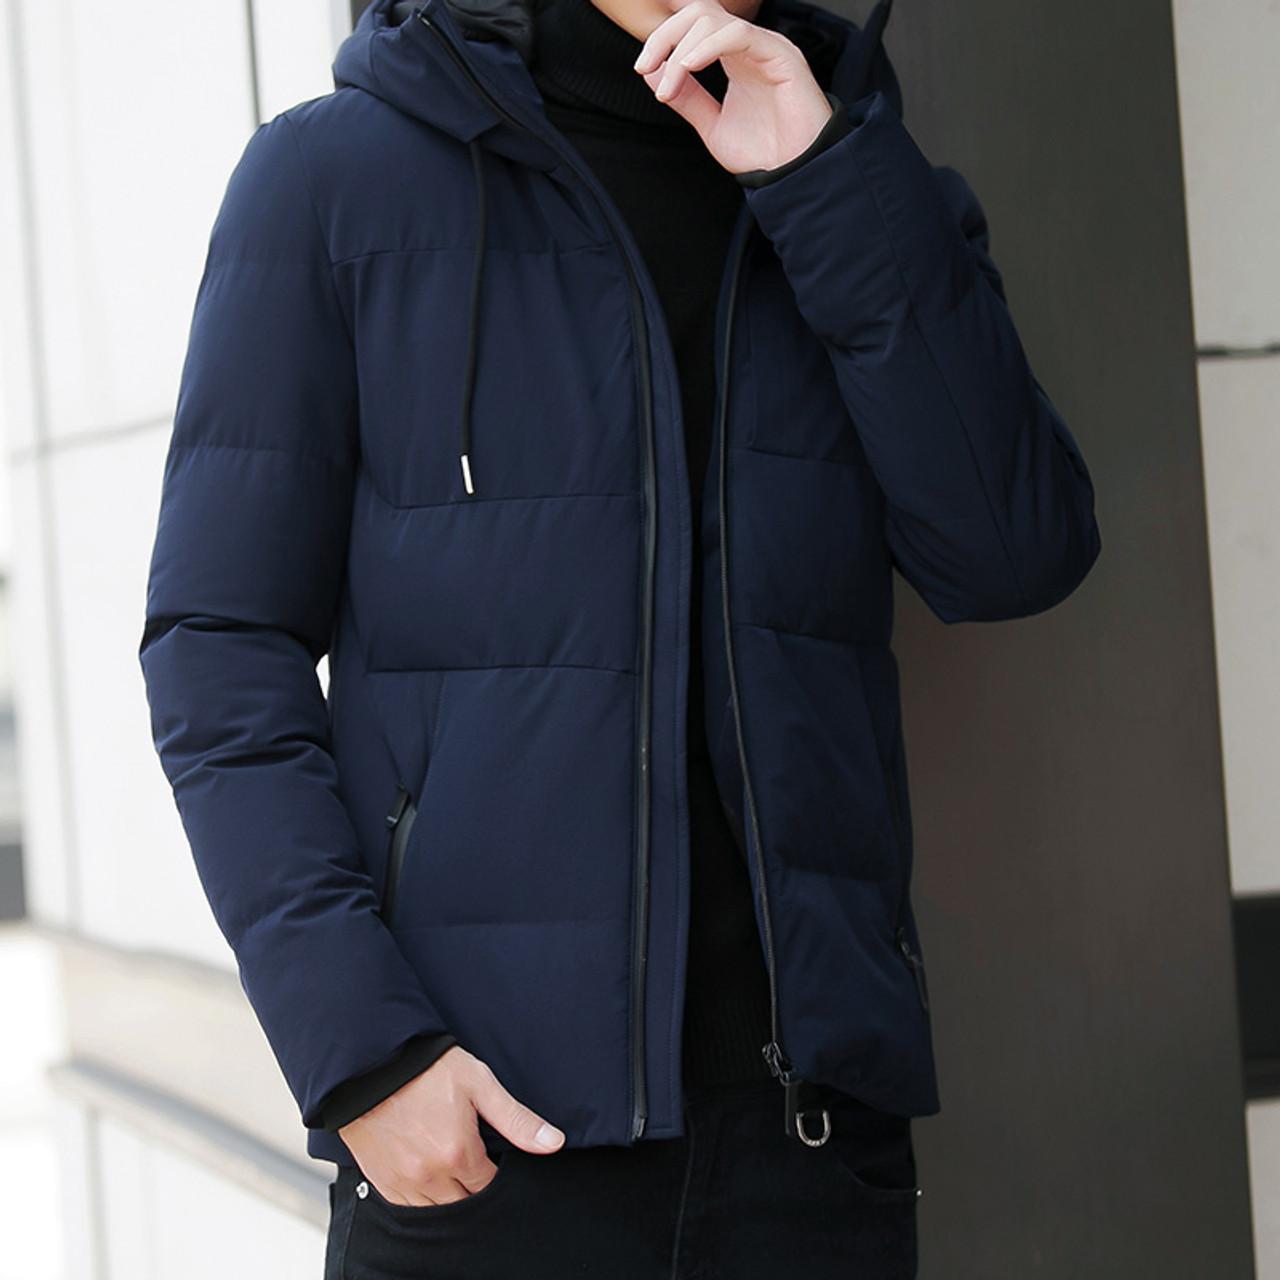 ec8f24b53da ... Winter Jacket Men Parka Fashion Hooded Jacket Slim Cotton Warm Jacket  Coat Men Solid Colo Thick ...